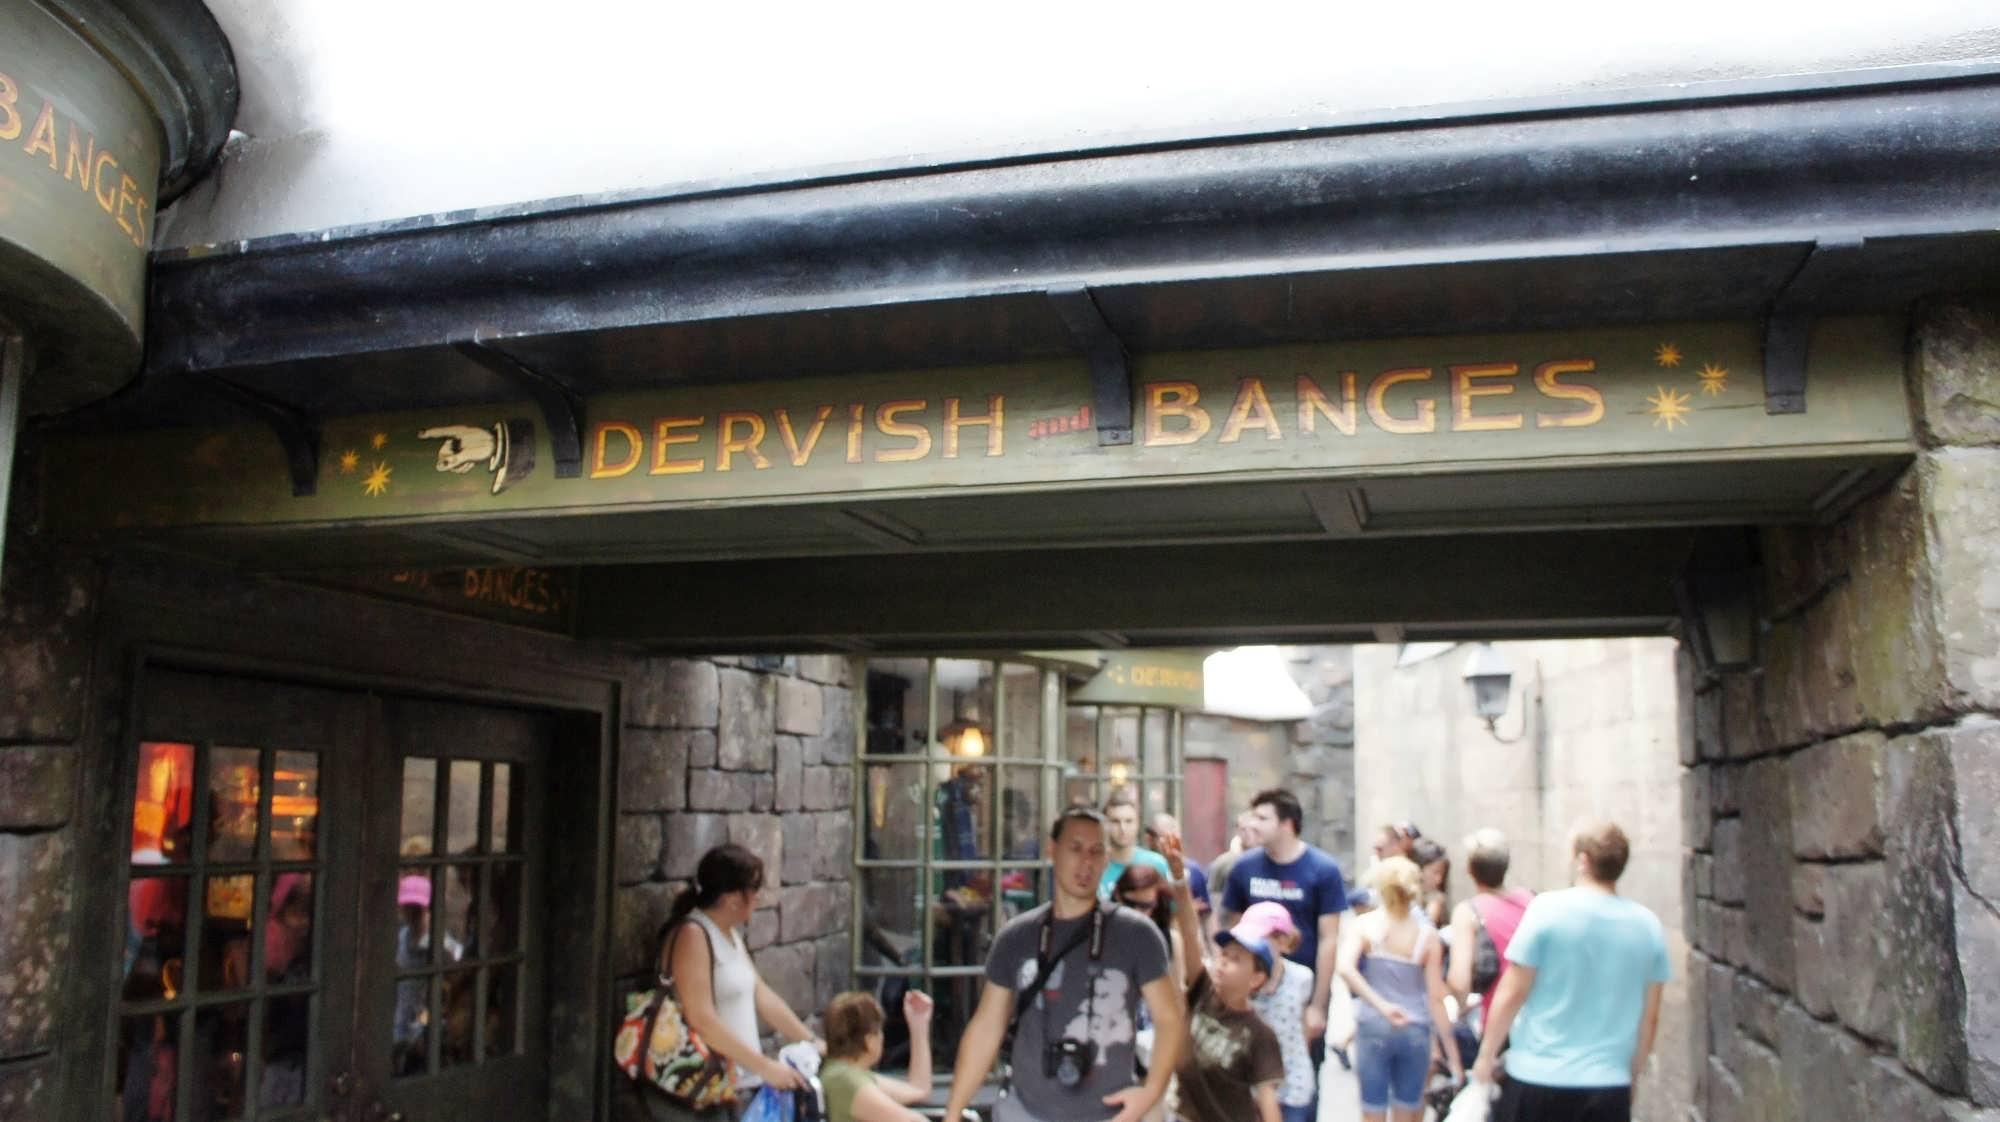 Dervish and Banges inside The Wizarding World of Harry Potter - Hogsmeade